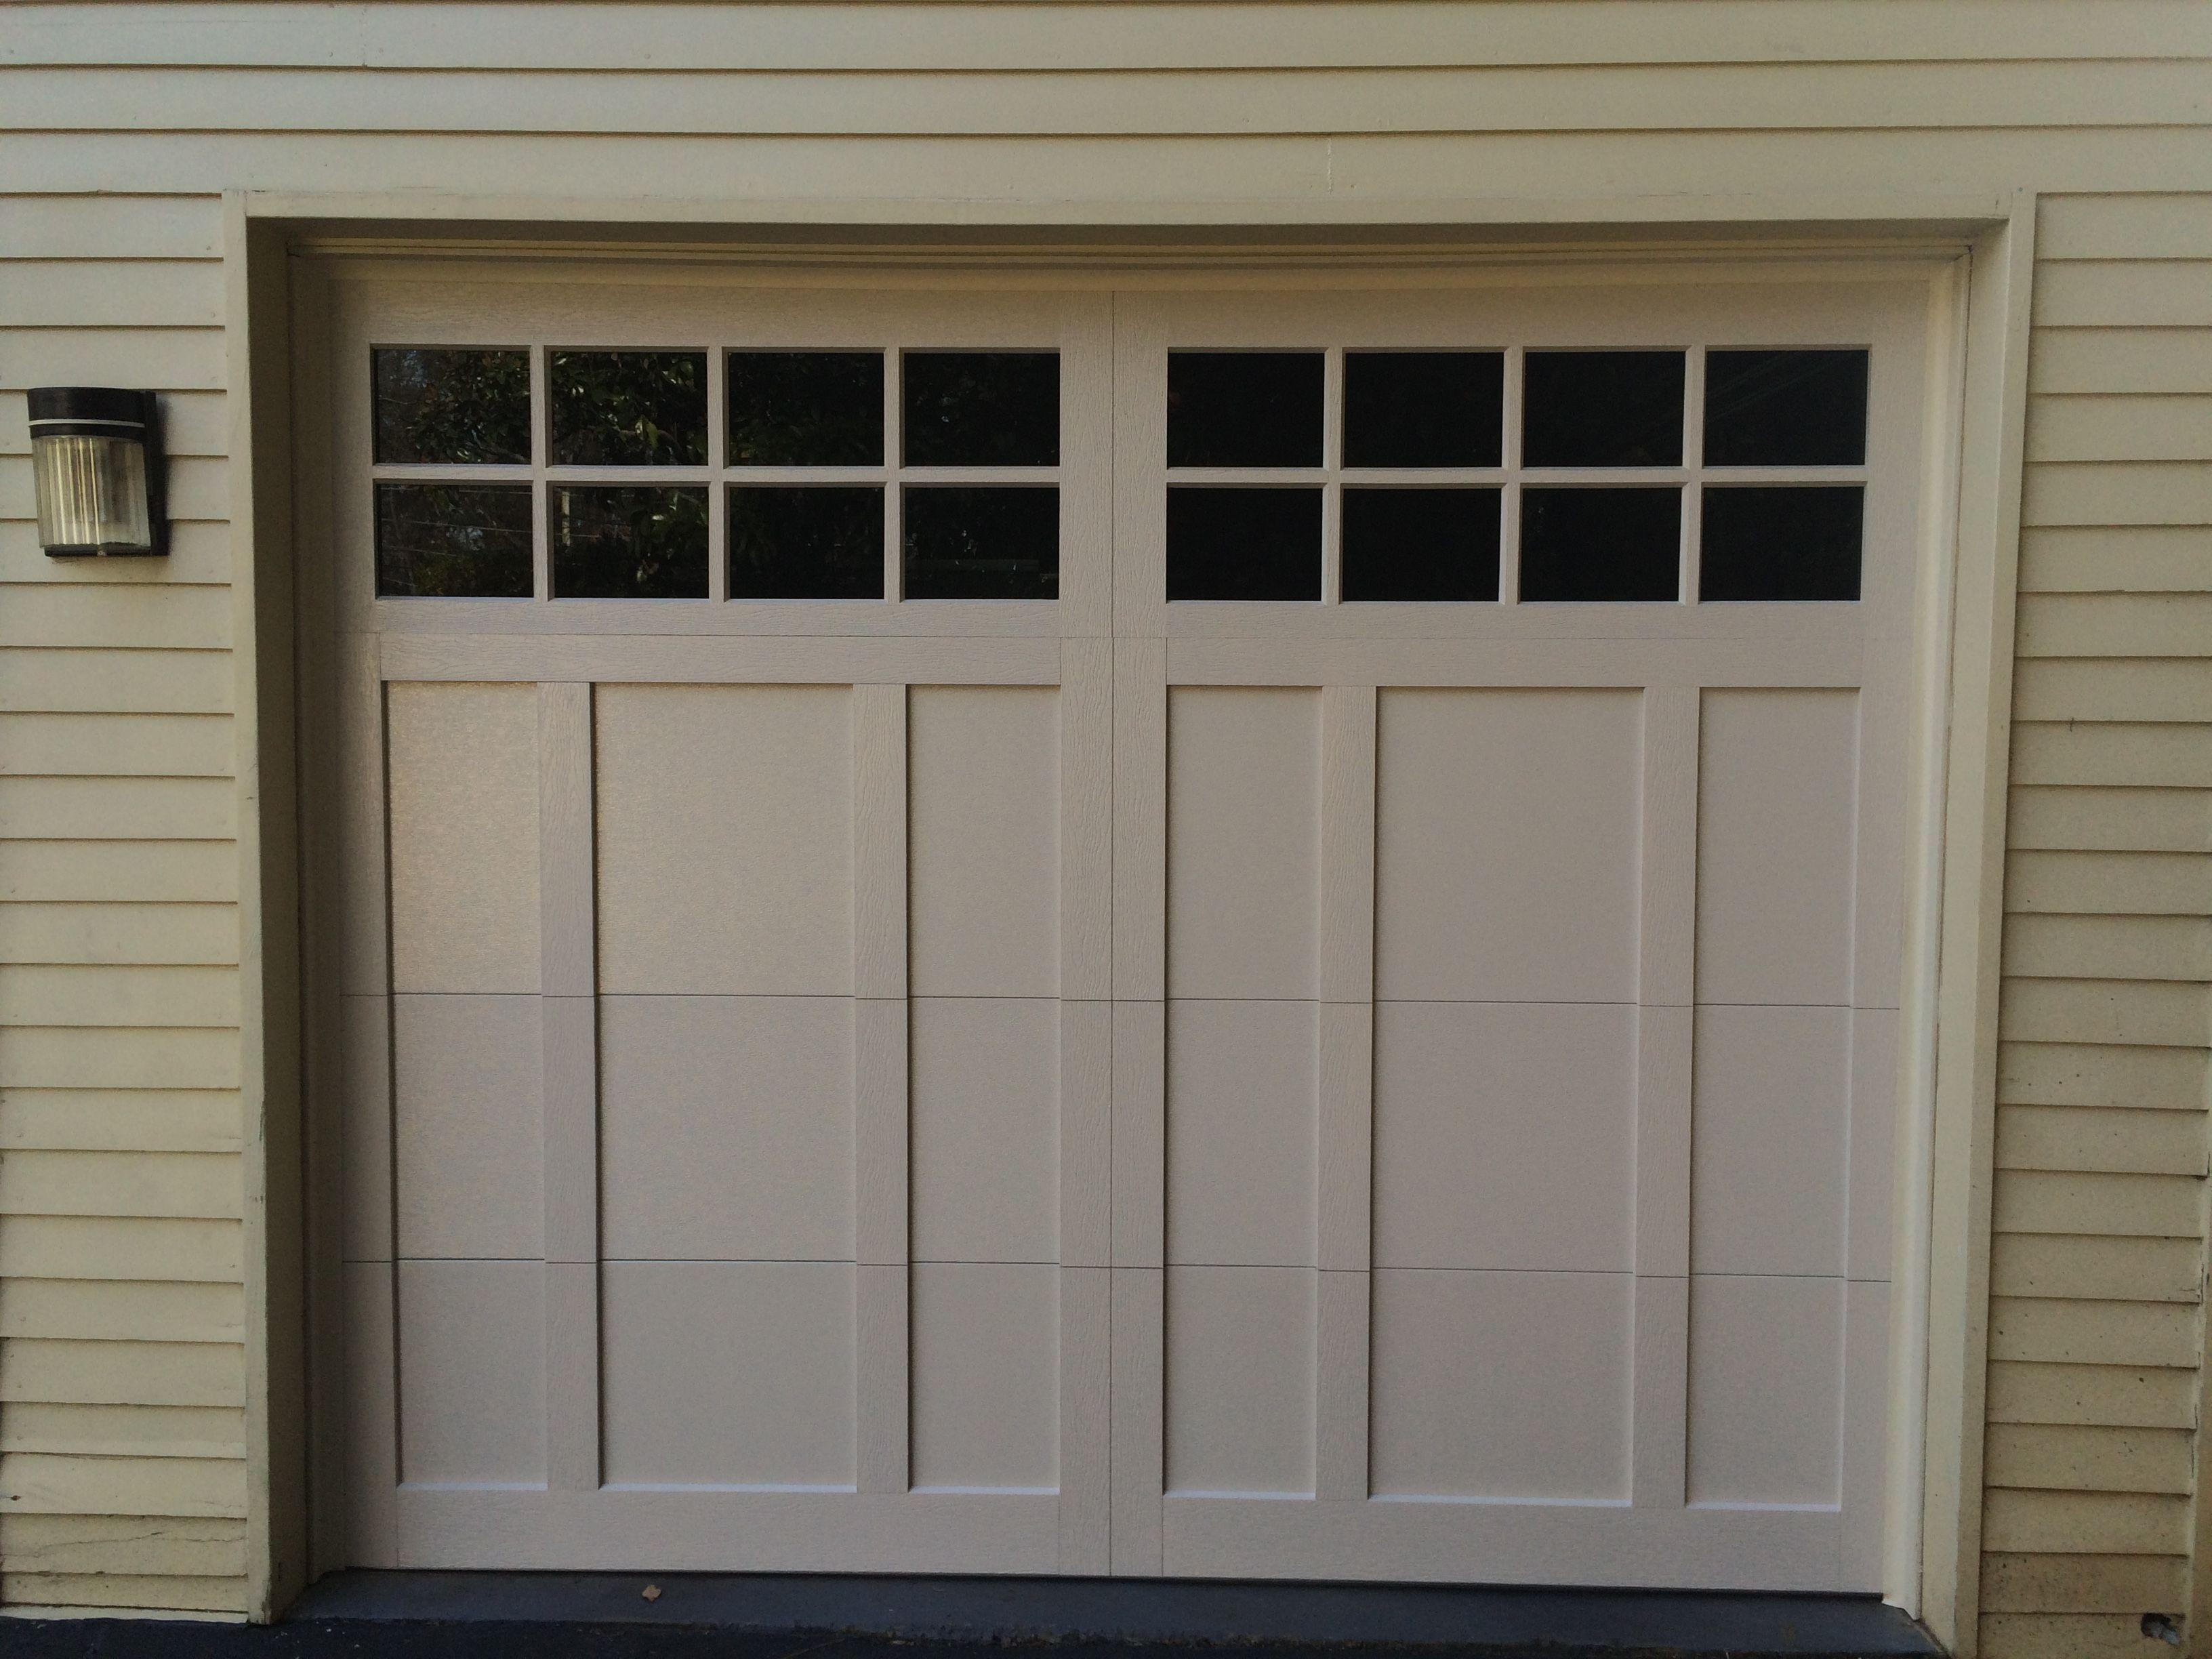 Off White Wooden Garage Door With 16 Rectangle Windows